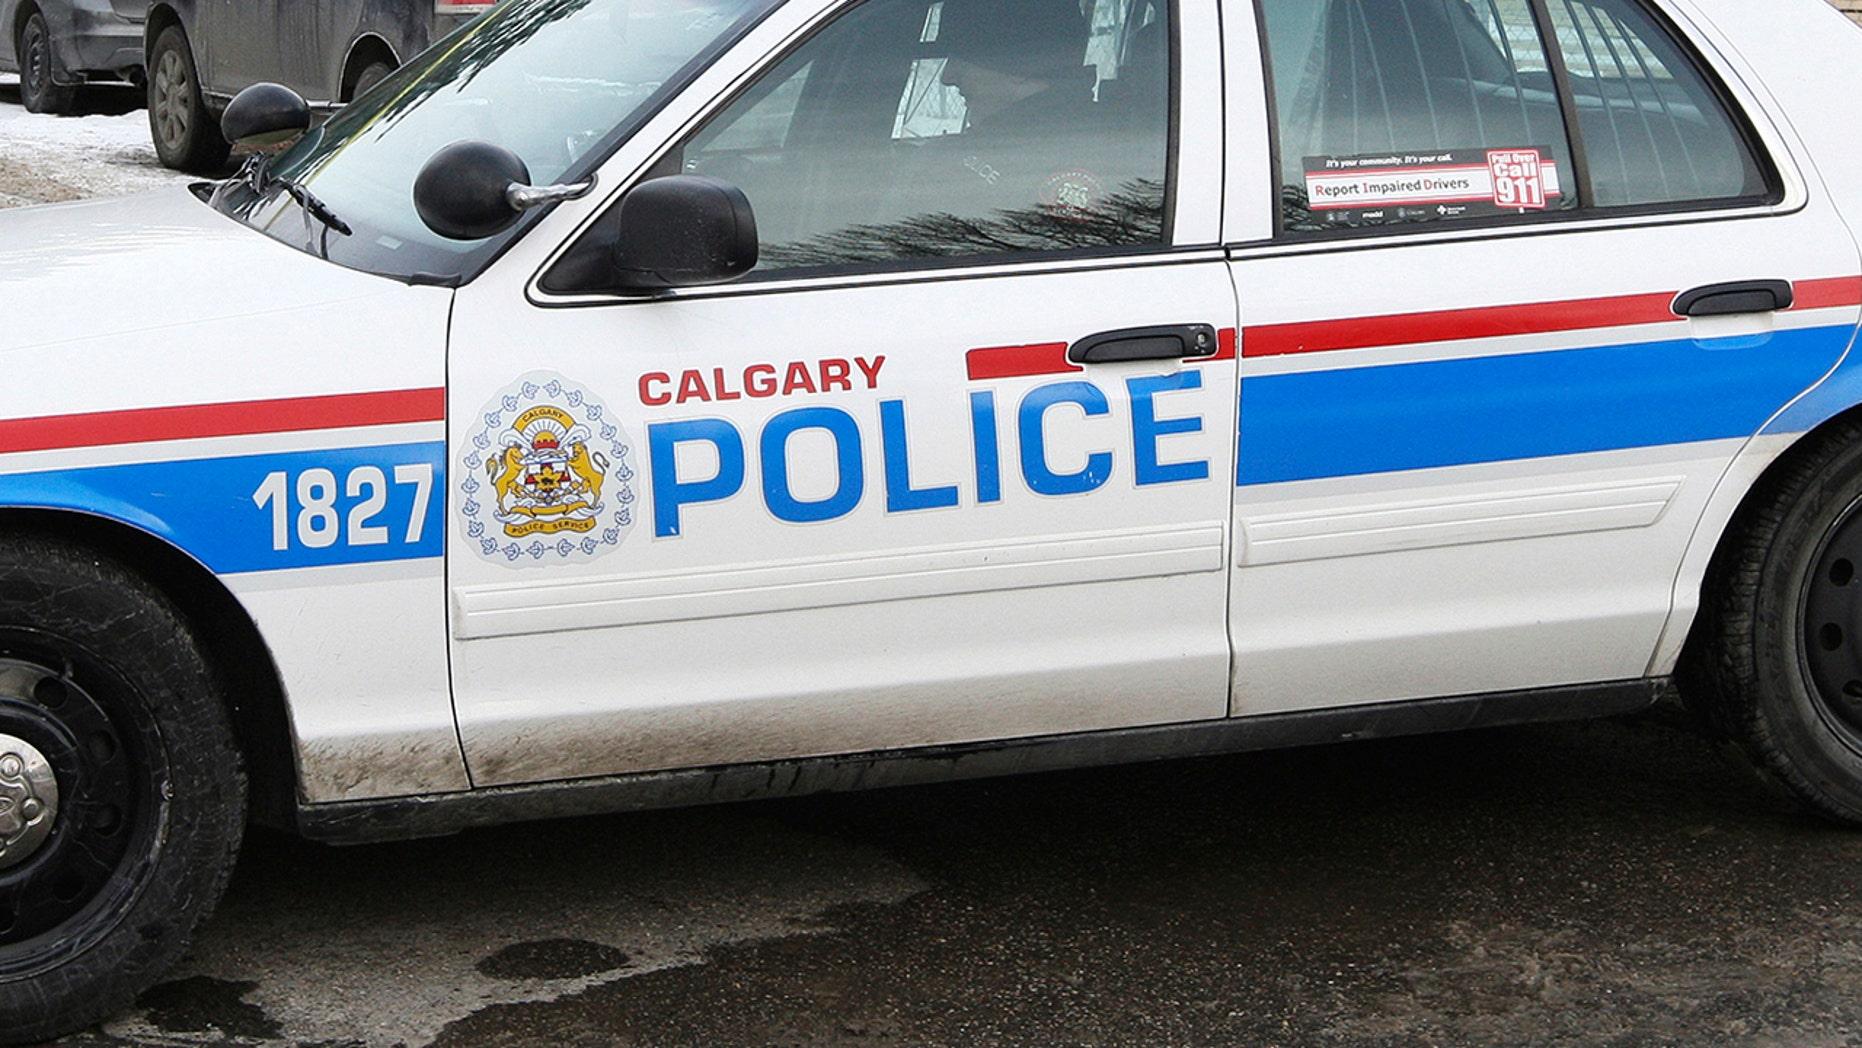 Calgary police said a man's body was found lodged behind a wall in a women's public bathroom.